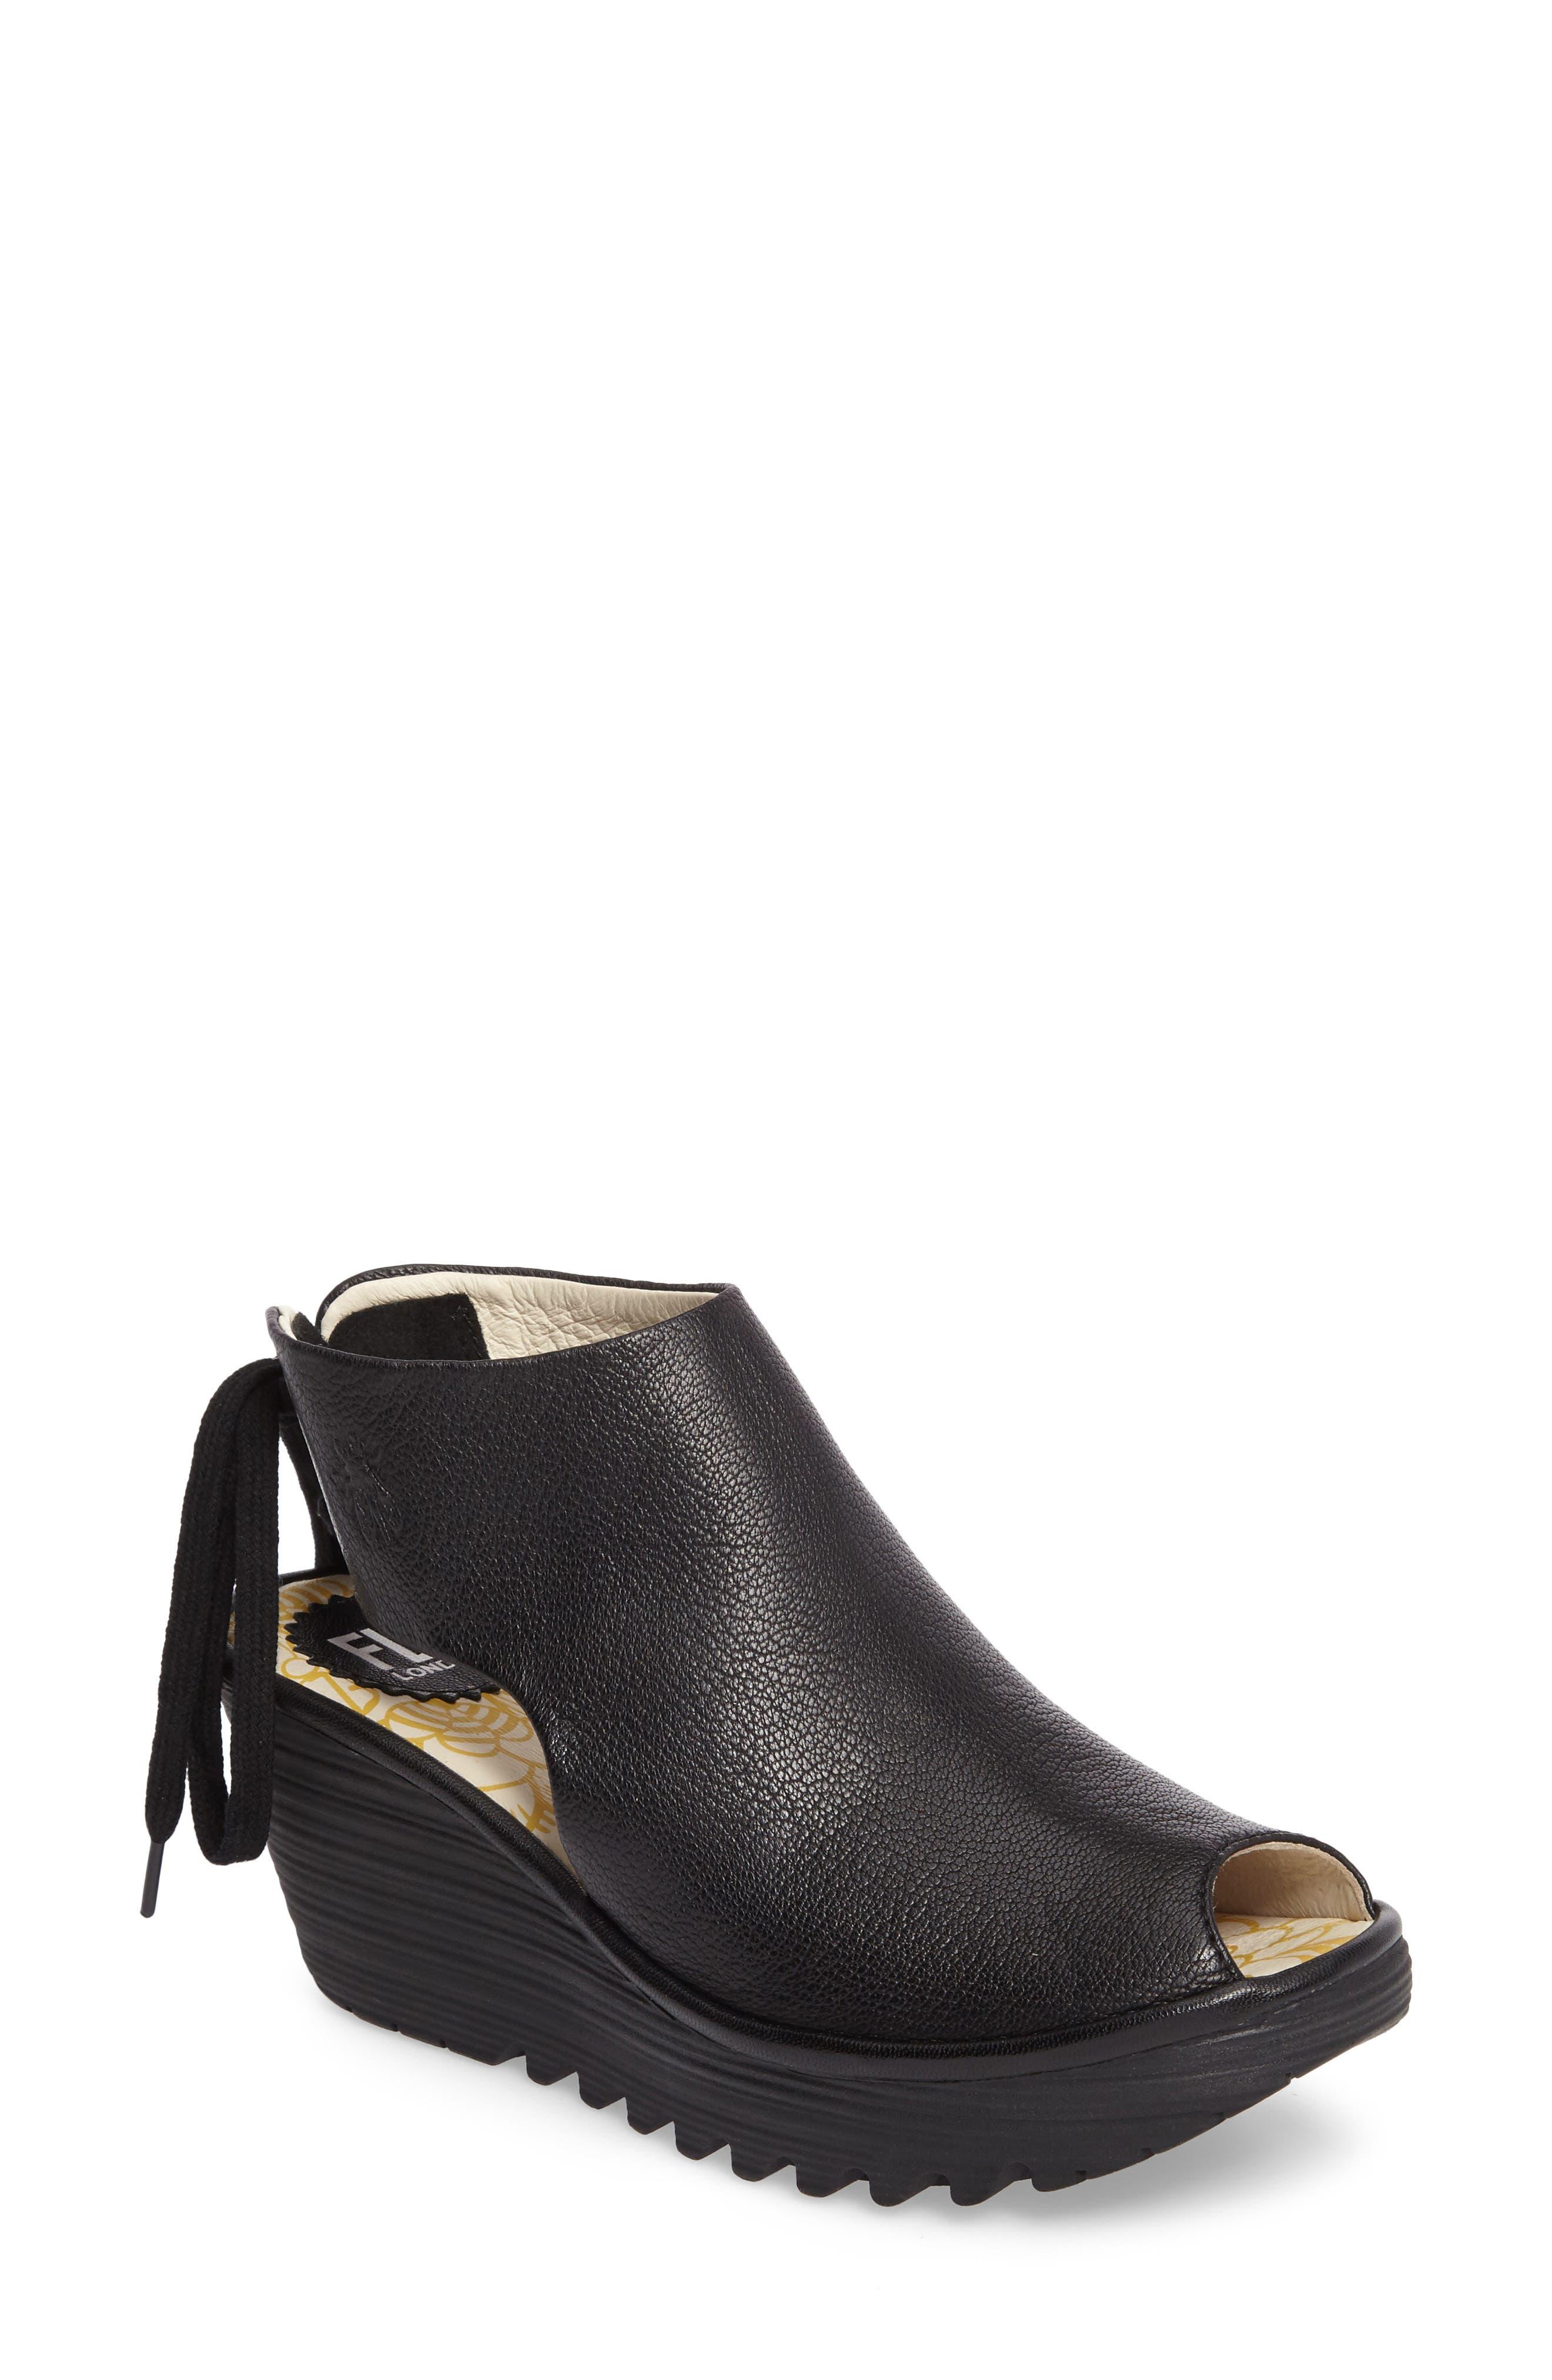 Yuzu Wedge Sandal,                         Main,                         color,